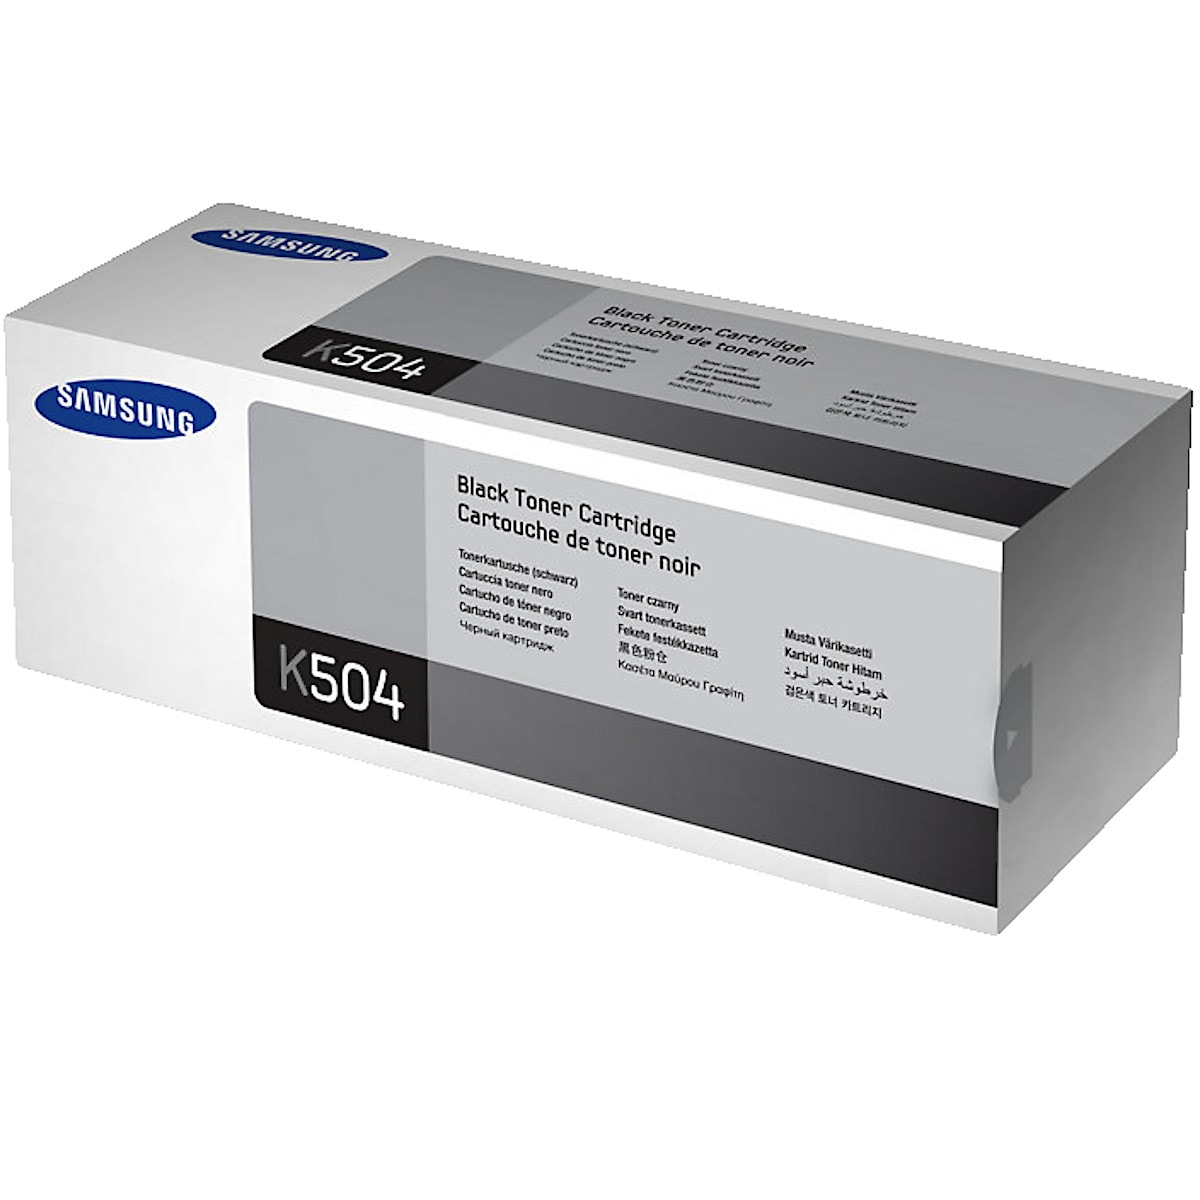 Samsung CLT-504S toner